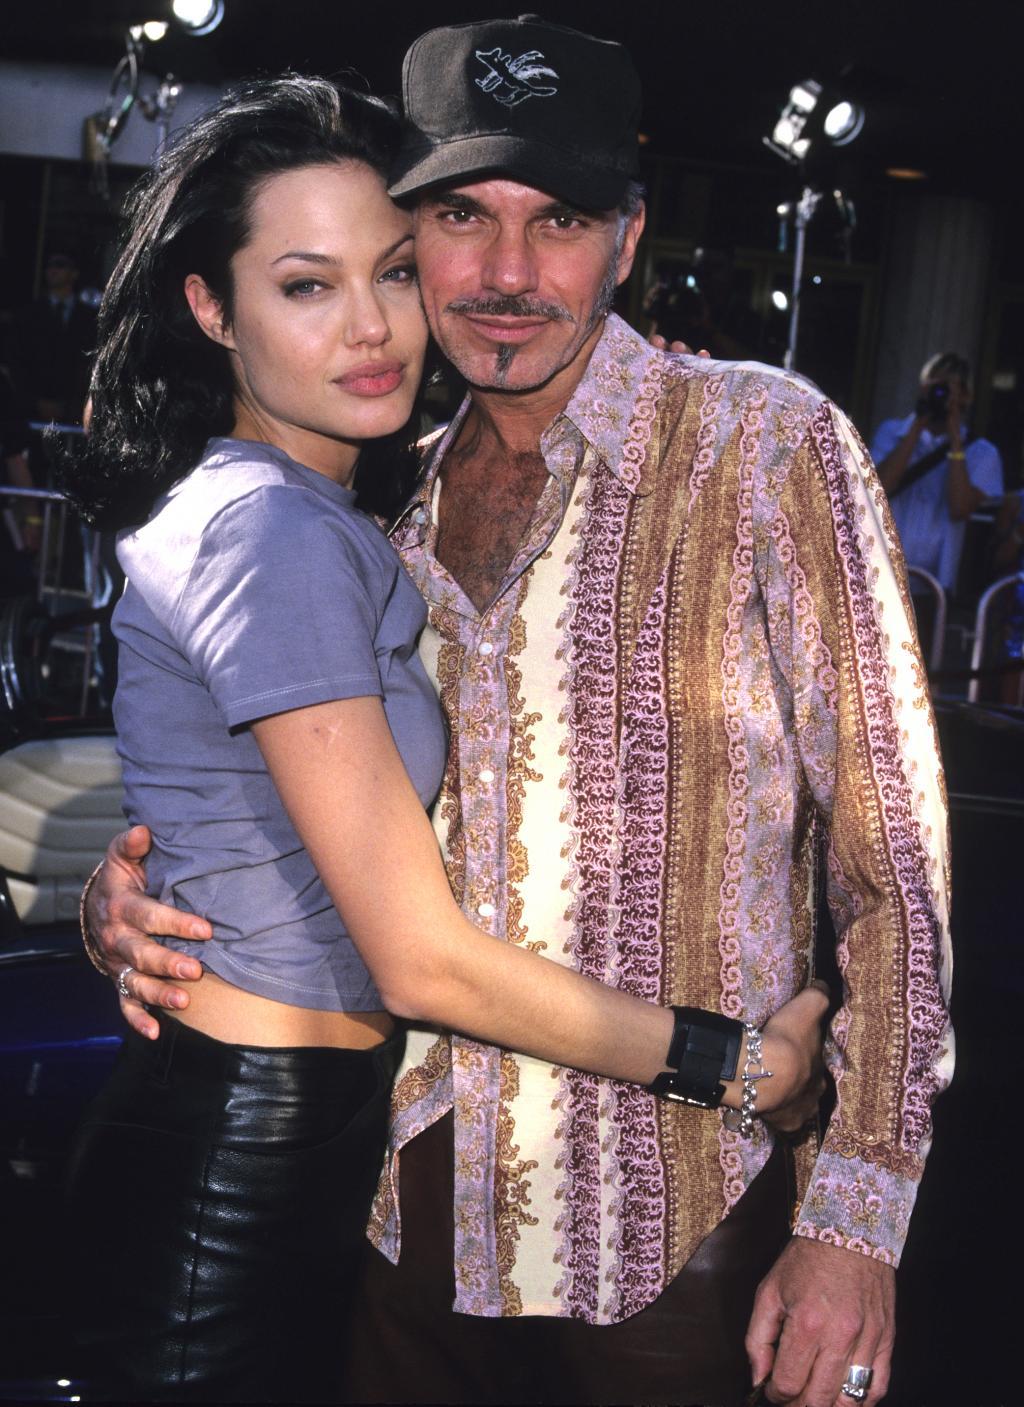 Billy Bob Thornton Says Angelina Jolie    Seems Okay '  Amid Brad Pitt Divorce